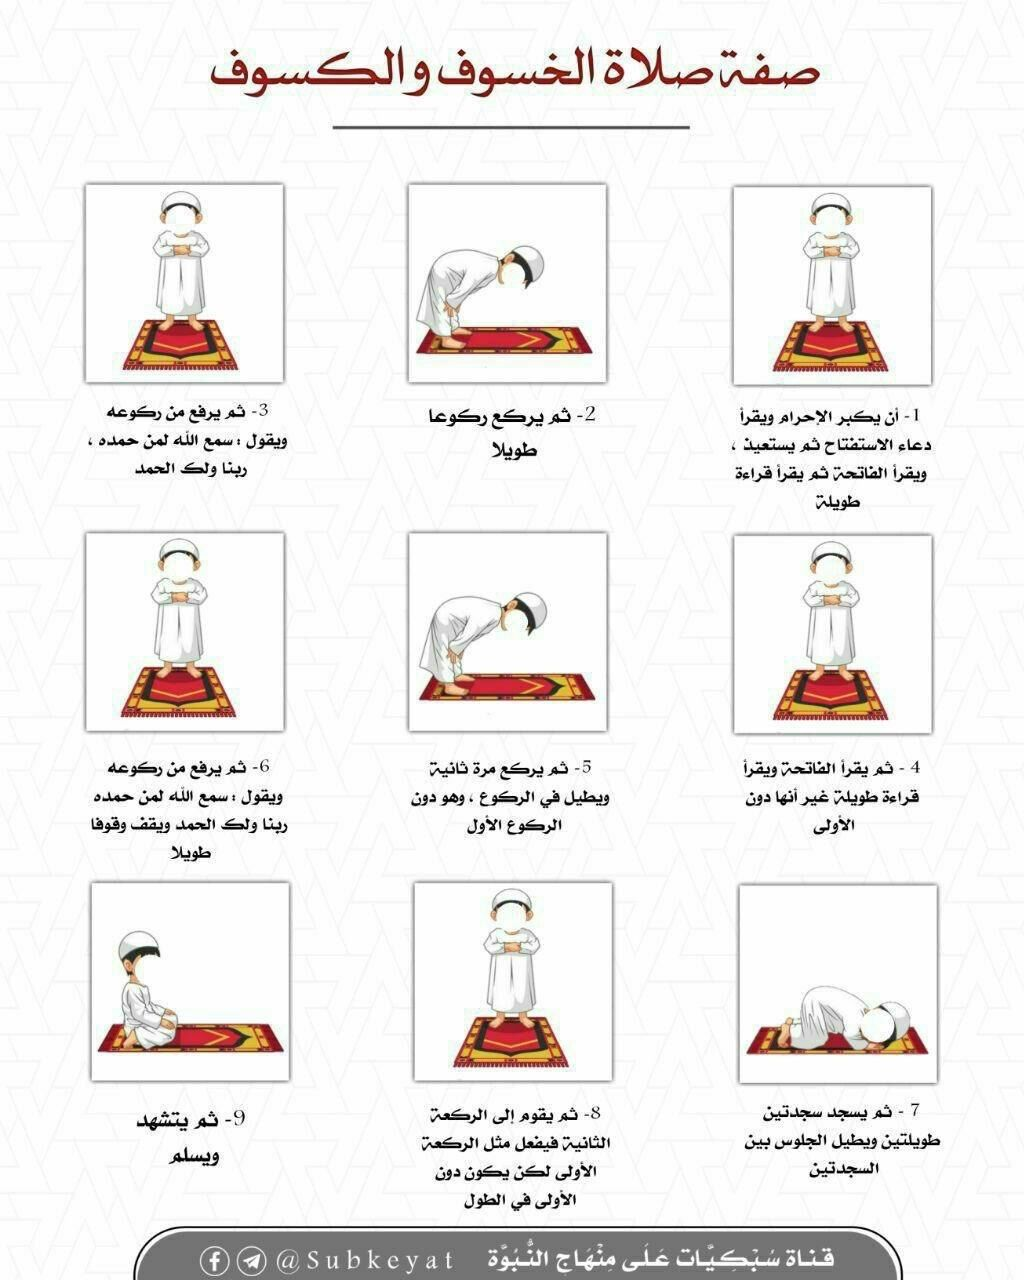 Pin By Marwa Amin On الصلاة Holiday Decor Decor Holiday